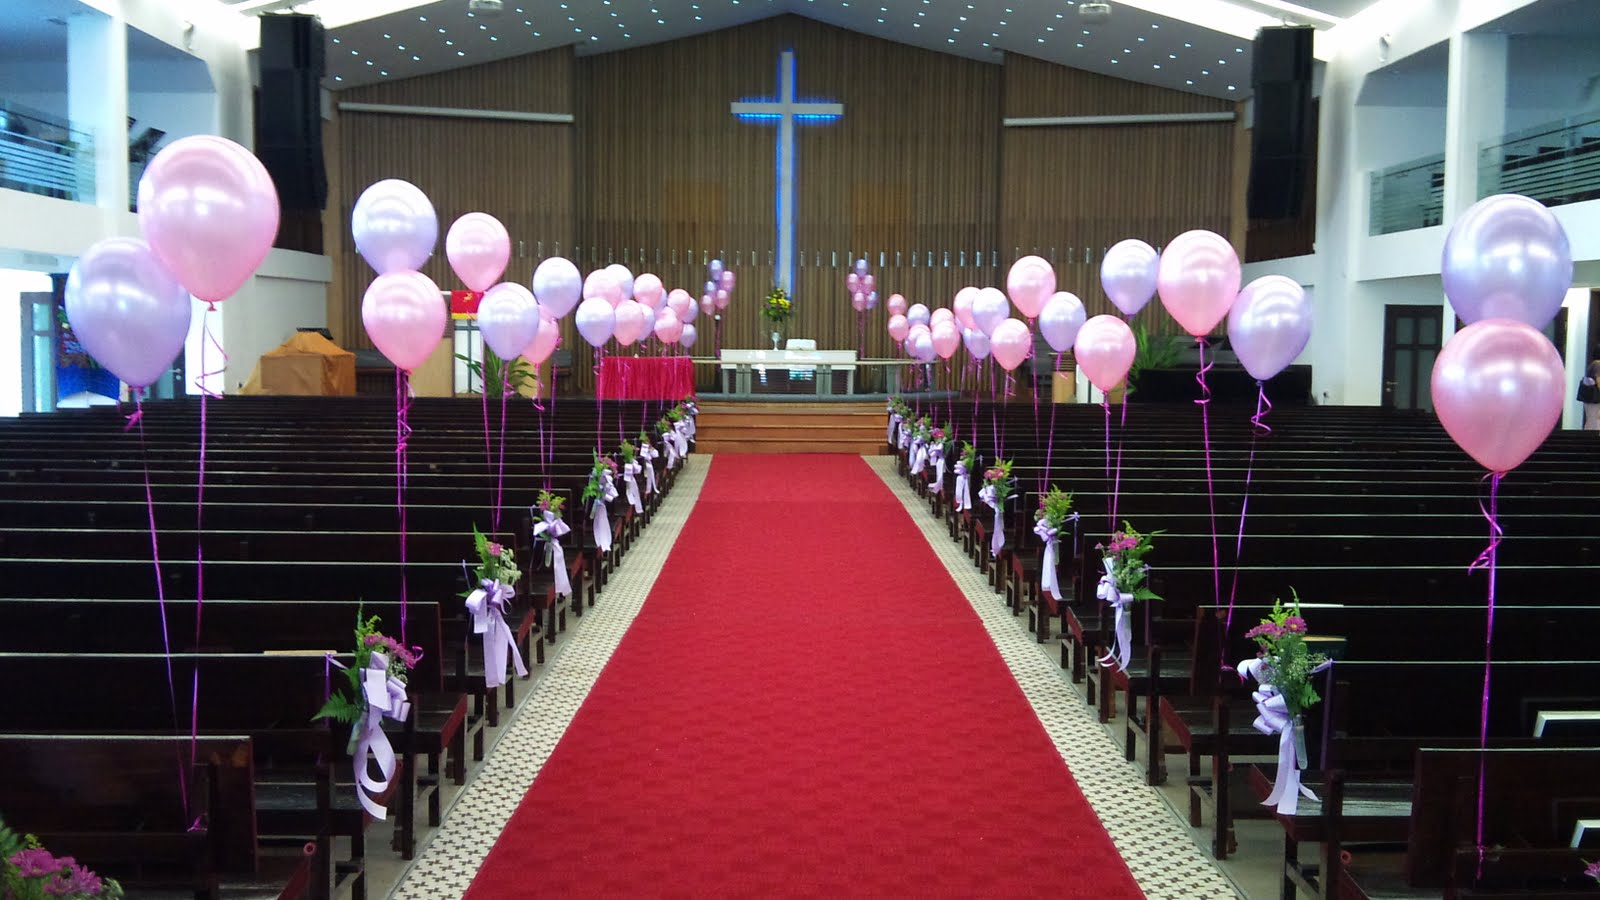 Bažnyčios puošimas vestuvėms balionais